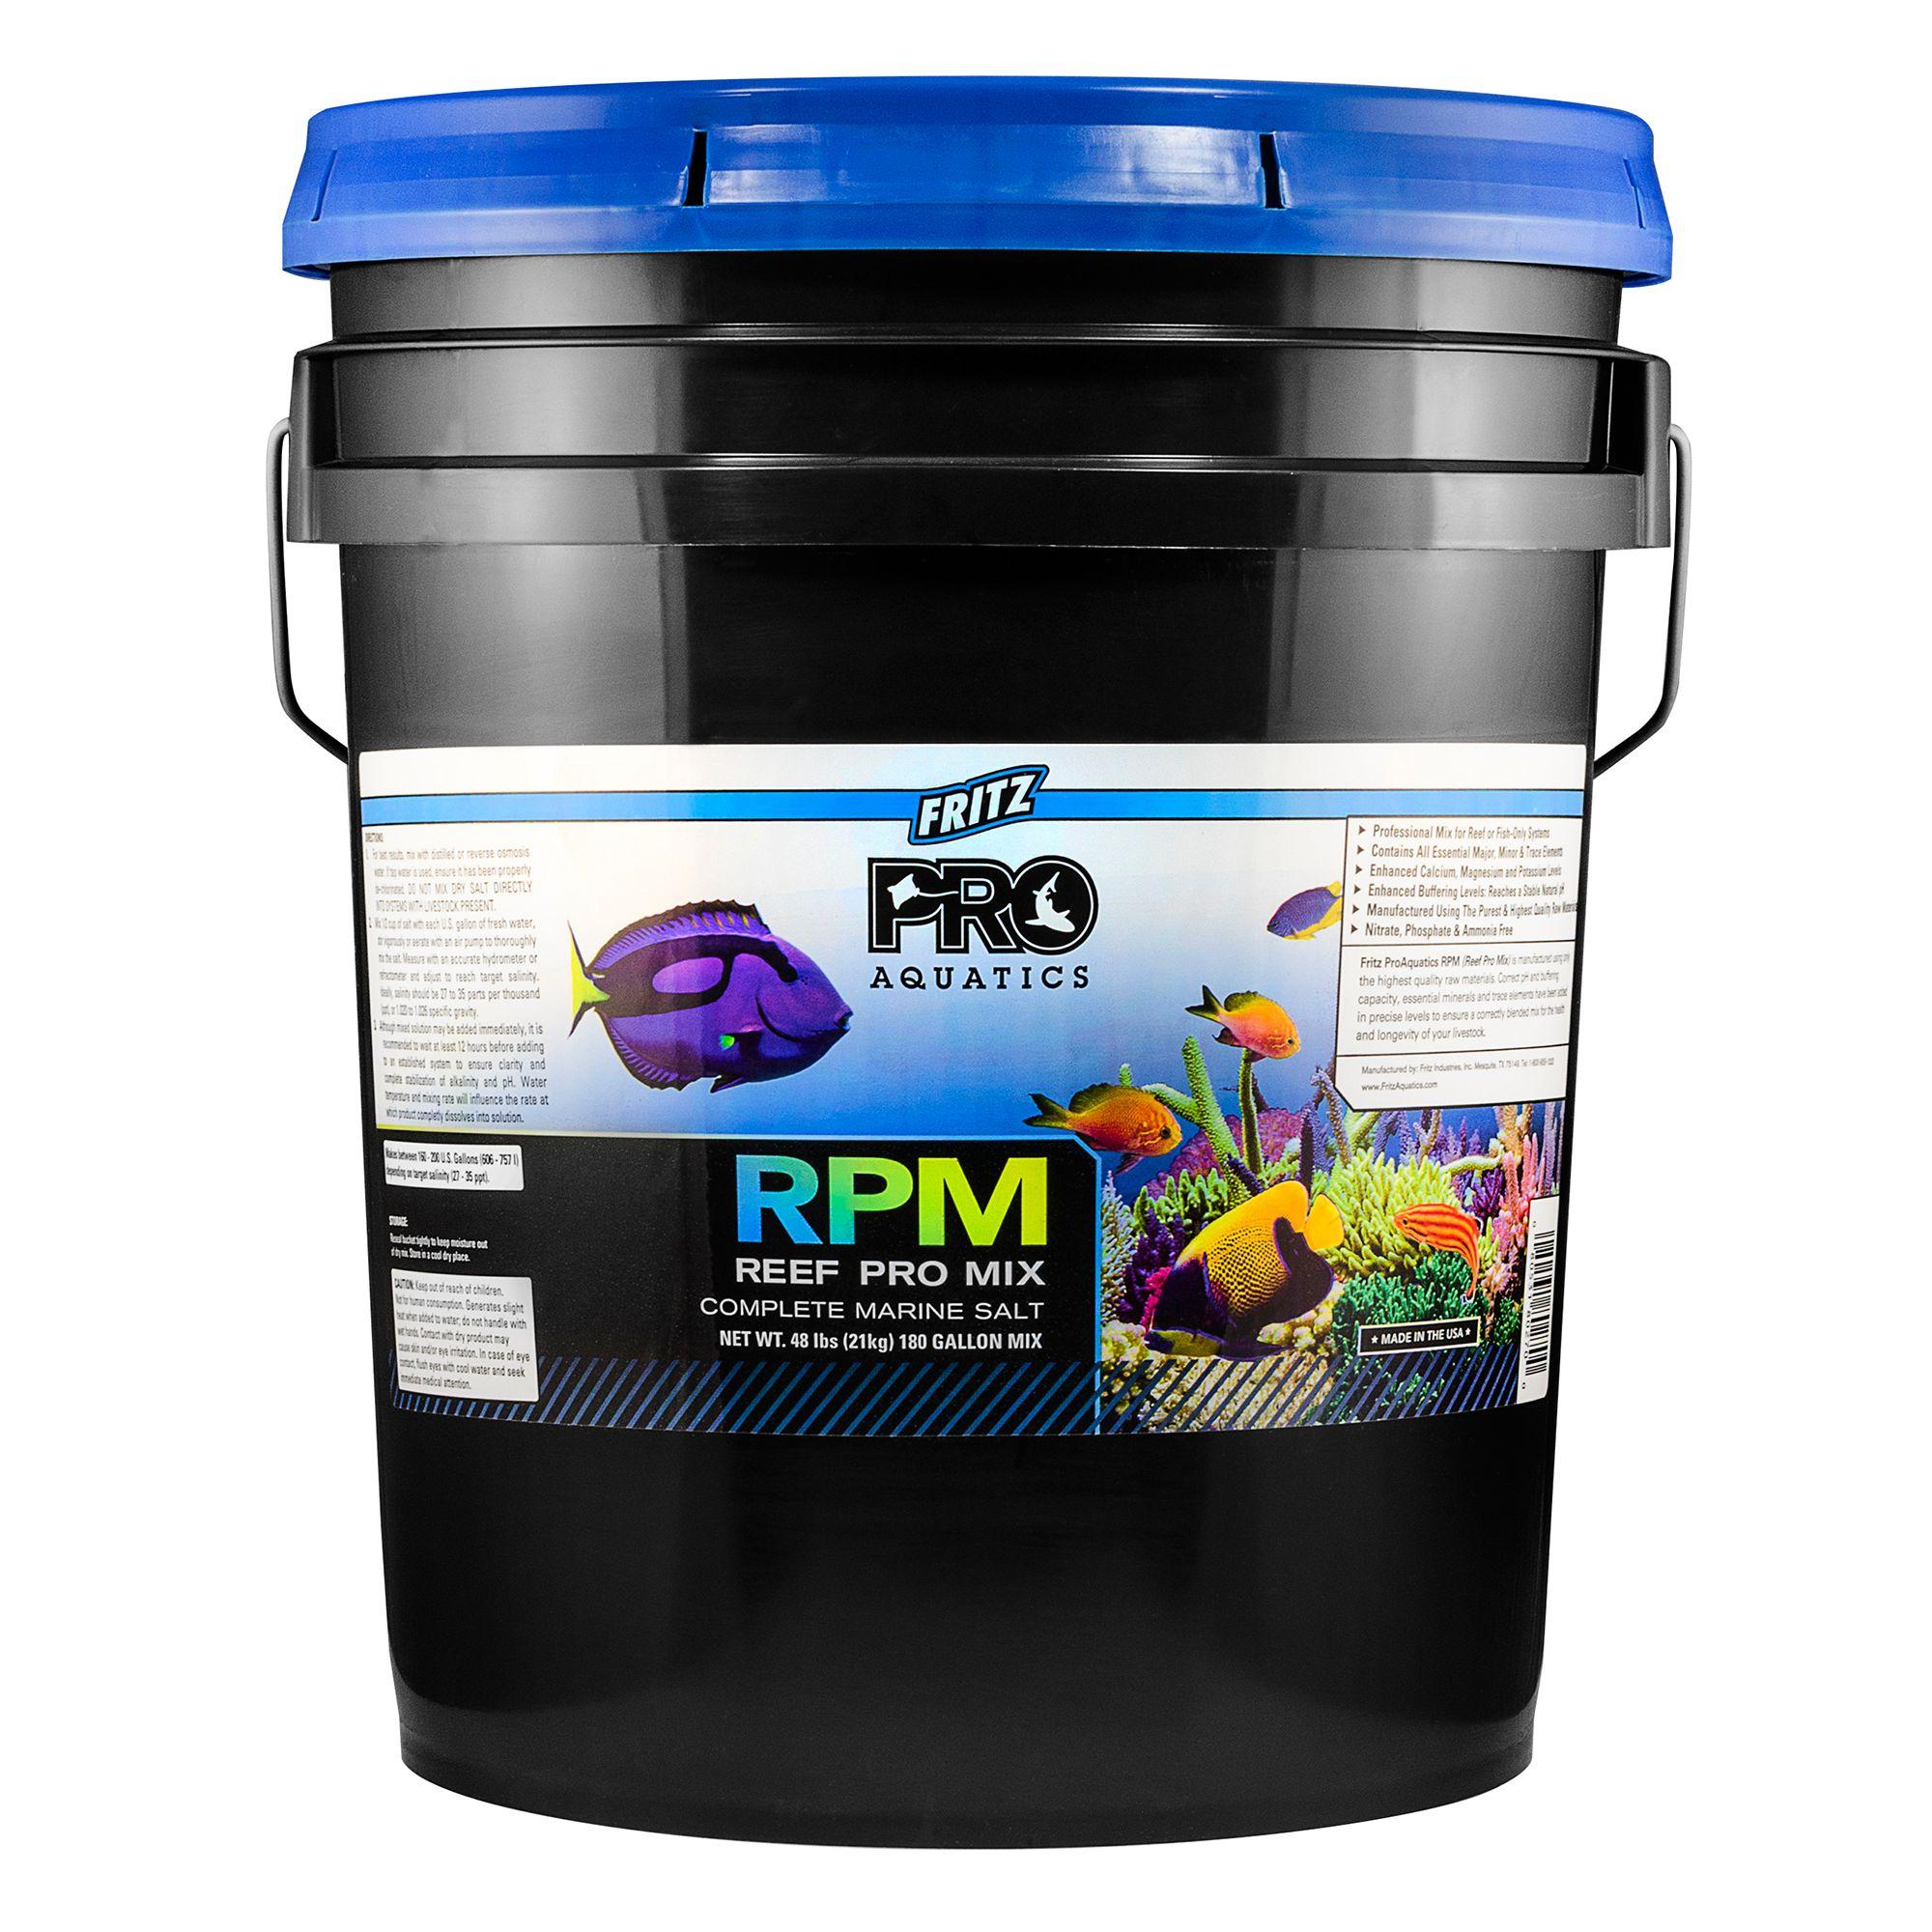 Fritz Proaquatics Reef Pro Mix Marine Salt Size 48 Lb